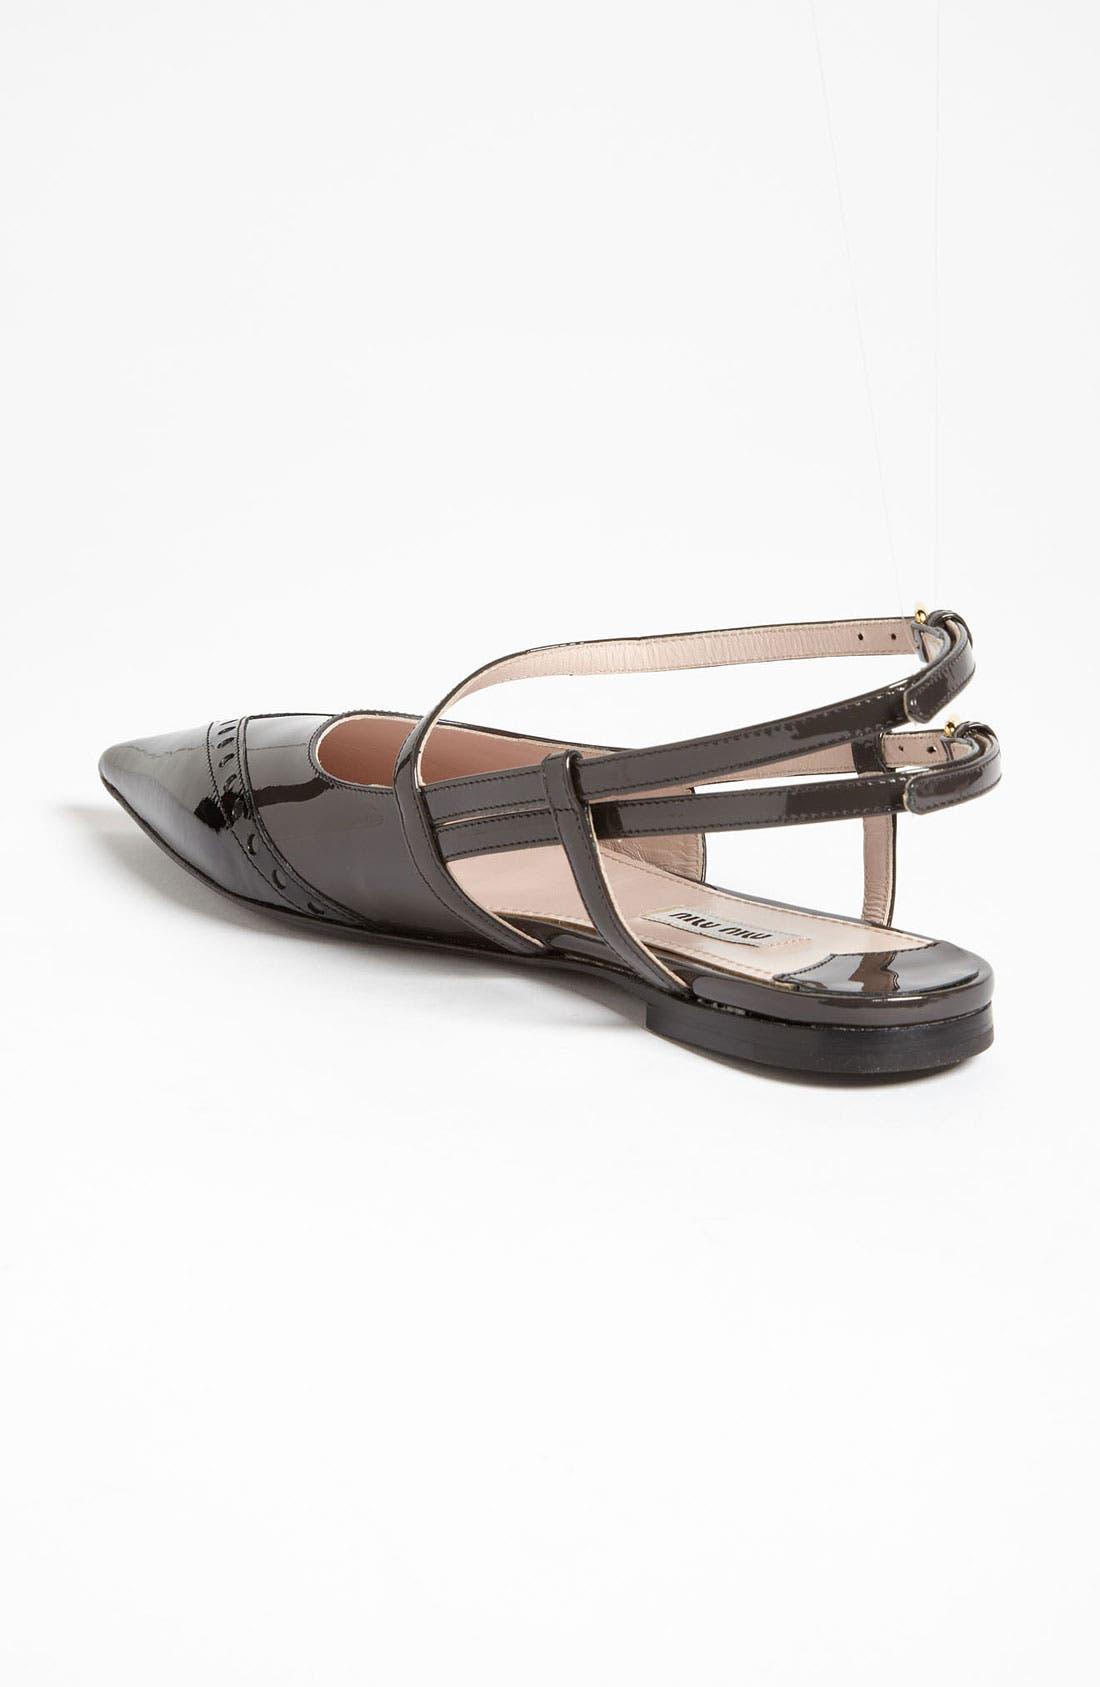 Alternate Image 2  - Miu Miu Pointed Toe Ballet Flat (Nordstrom Exclusive)